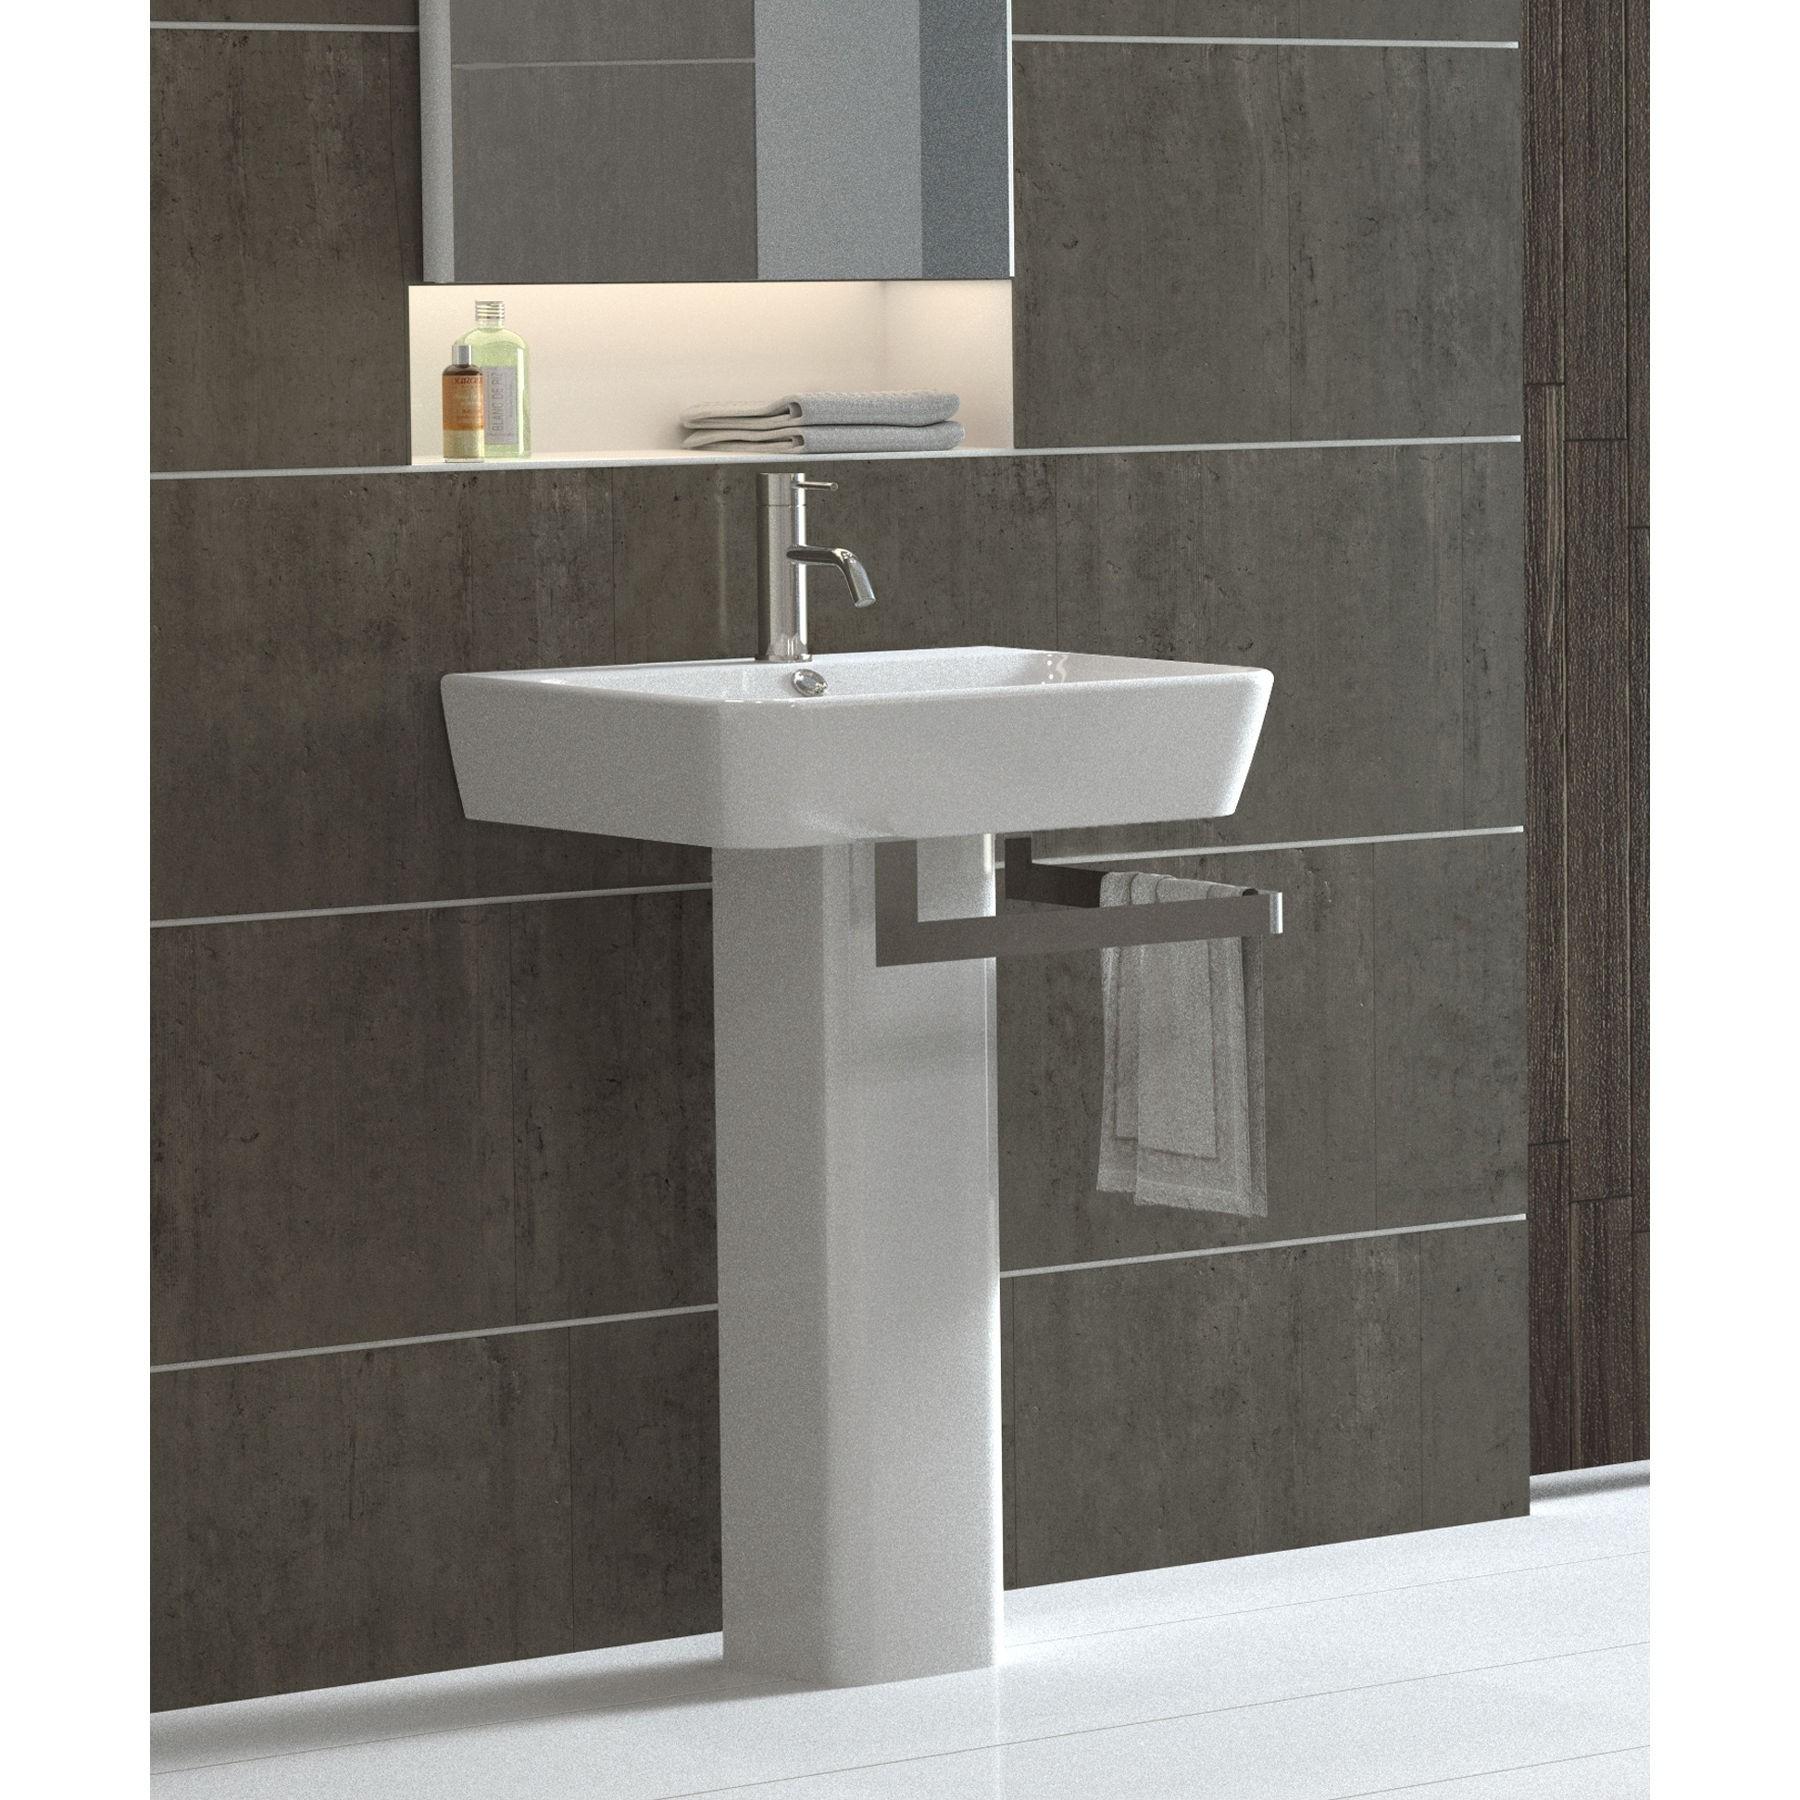 modern pedestal sinks for small